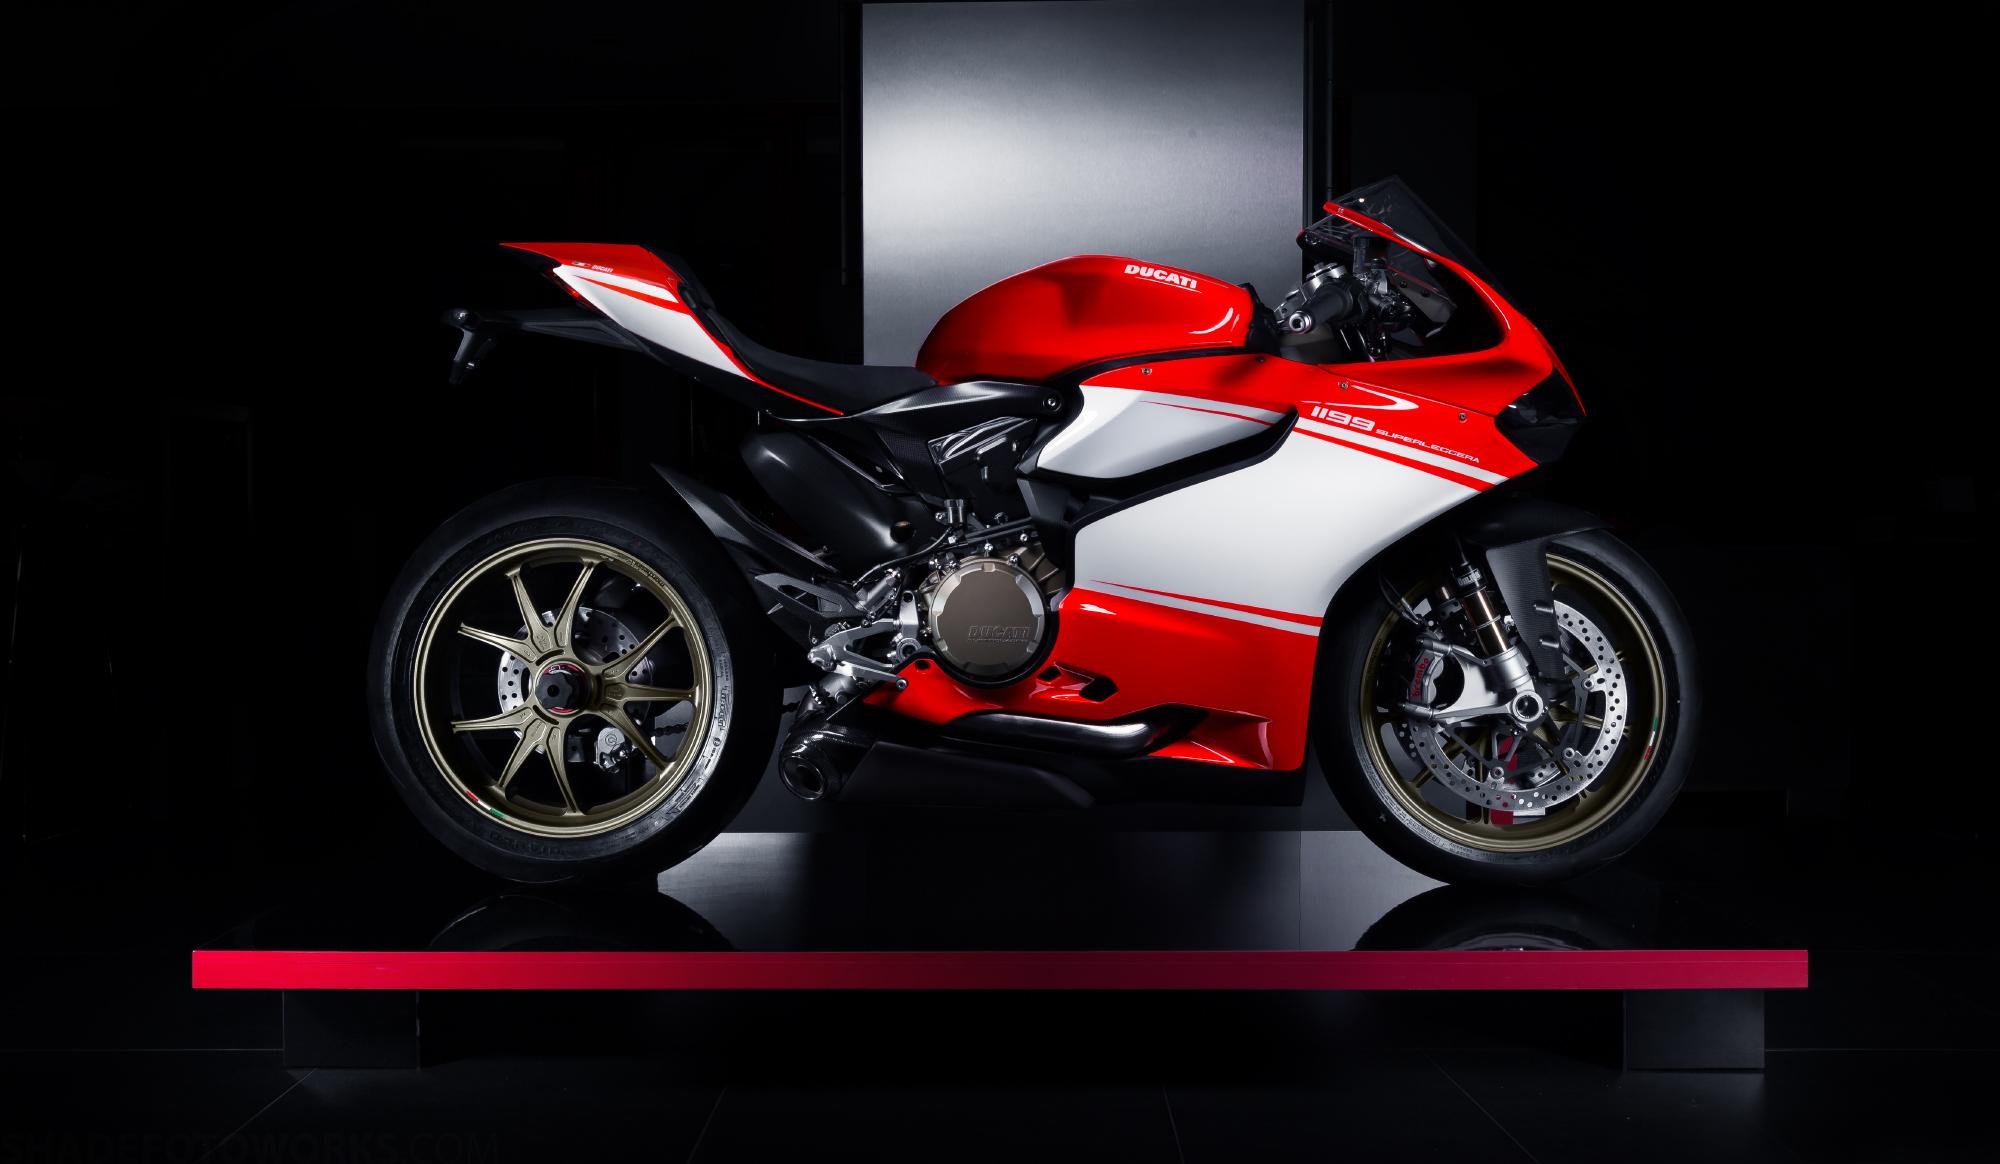 Ducati 1098 Superleggera 899 1199 Panigale